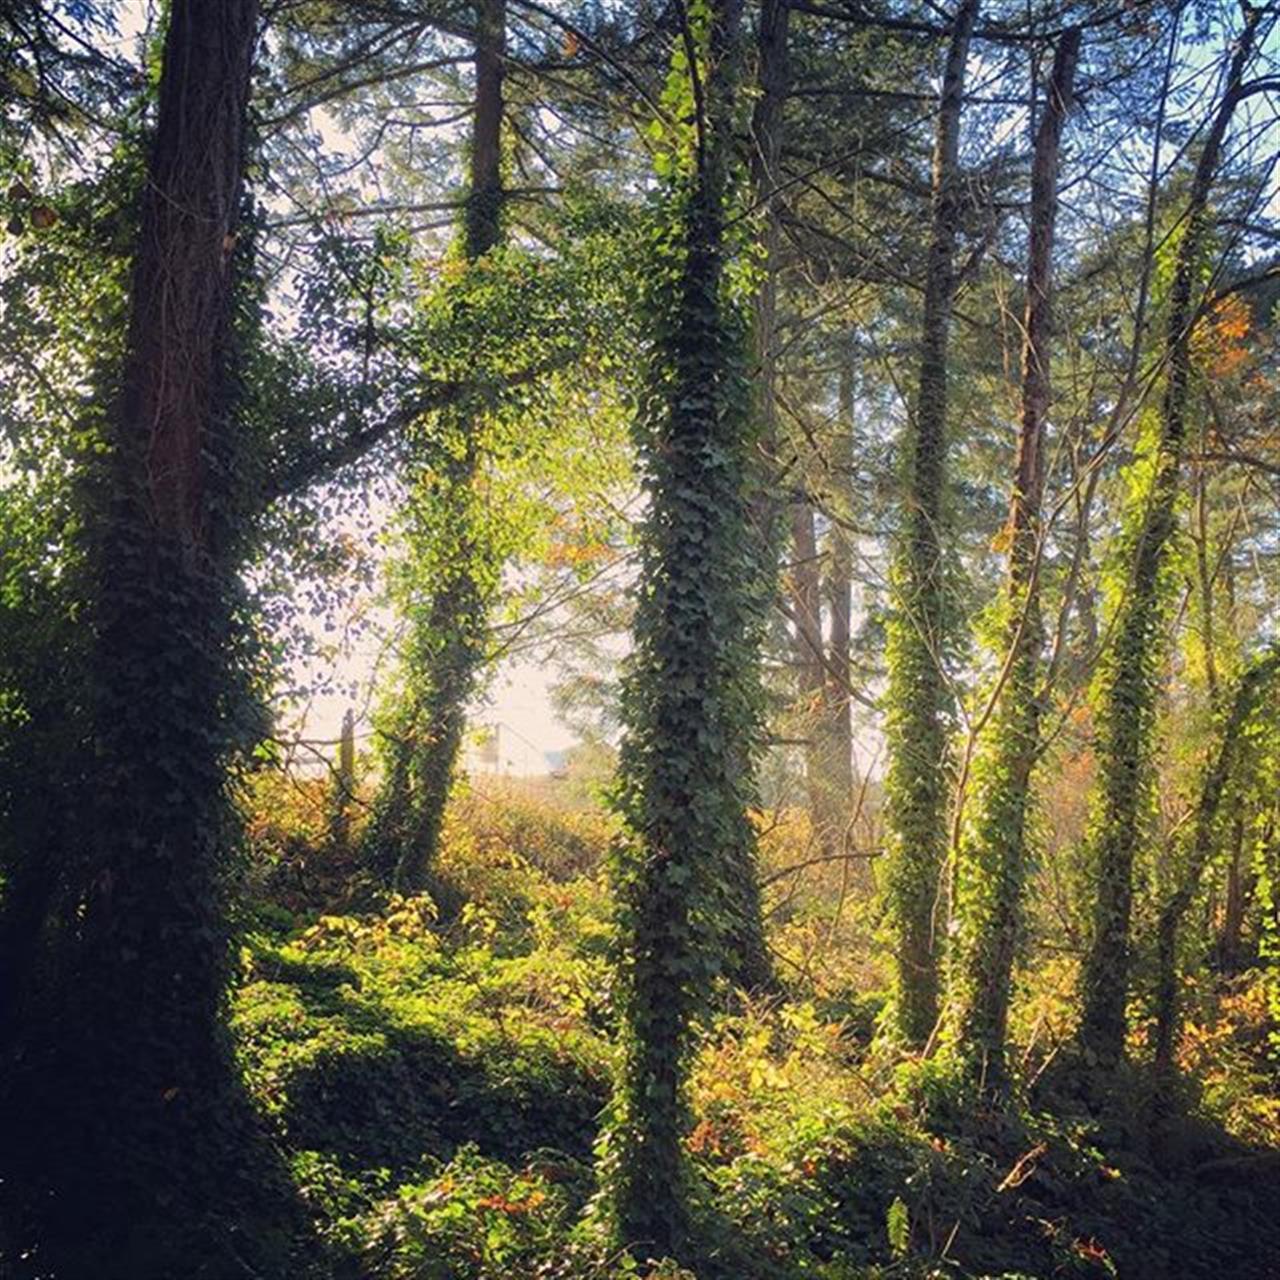 #sneakpeek #newlistingcomingthisweek #notallhousesaremoveinready #dfhrealestate #leadingrelocal #beautifulproperty #rural #trees